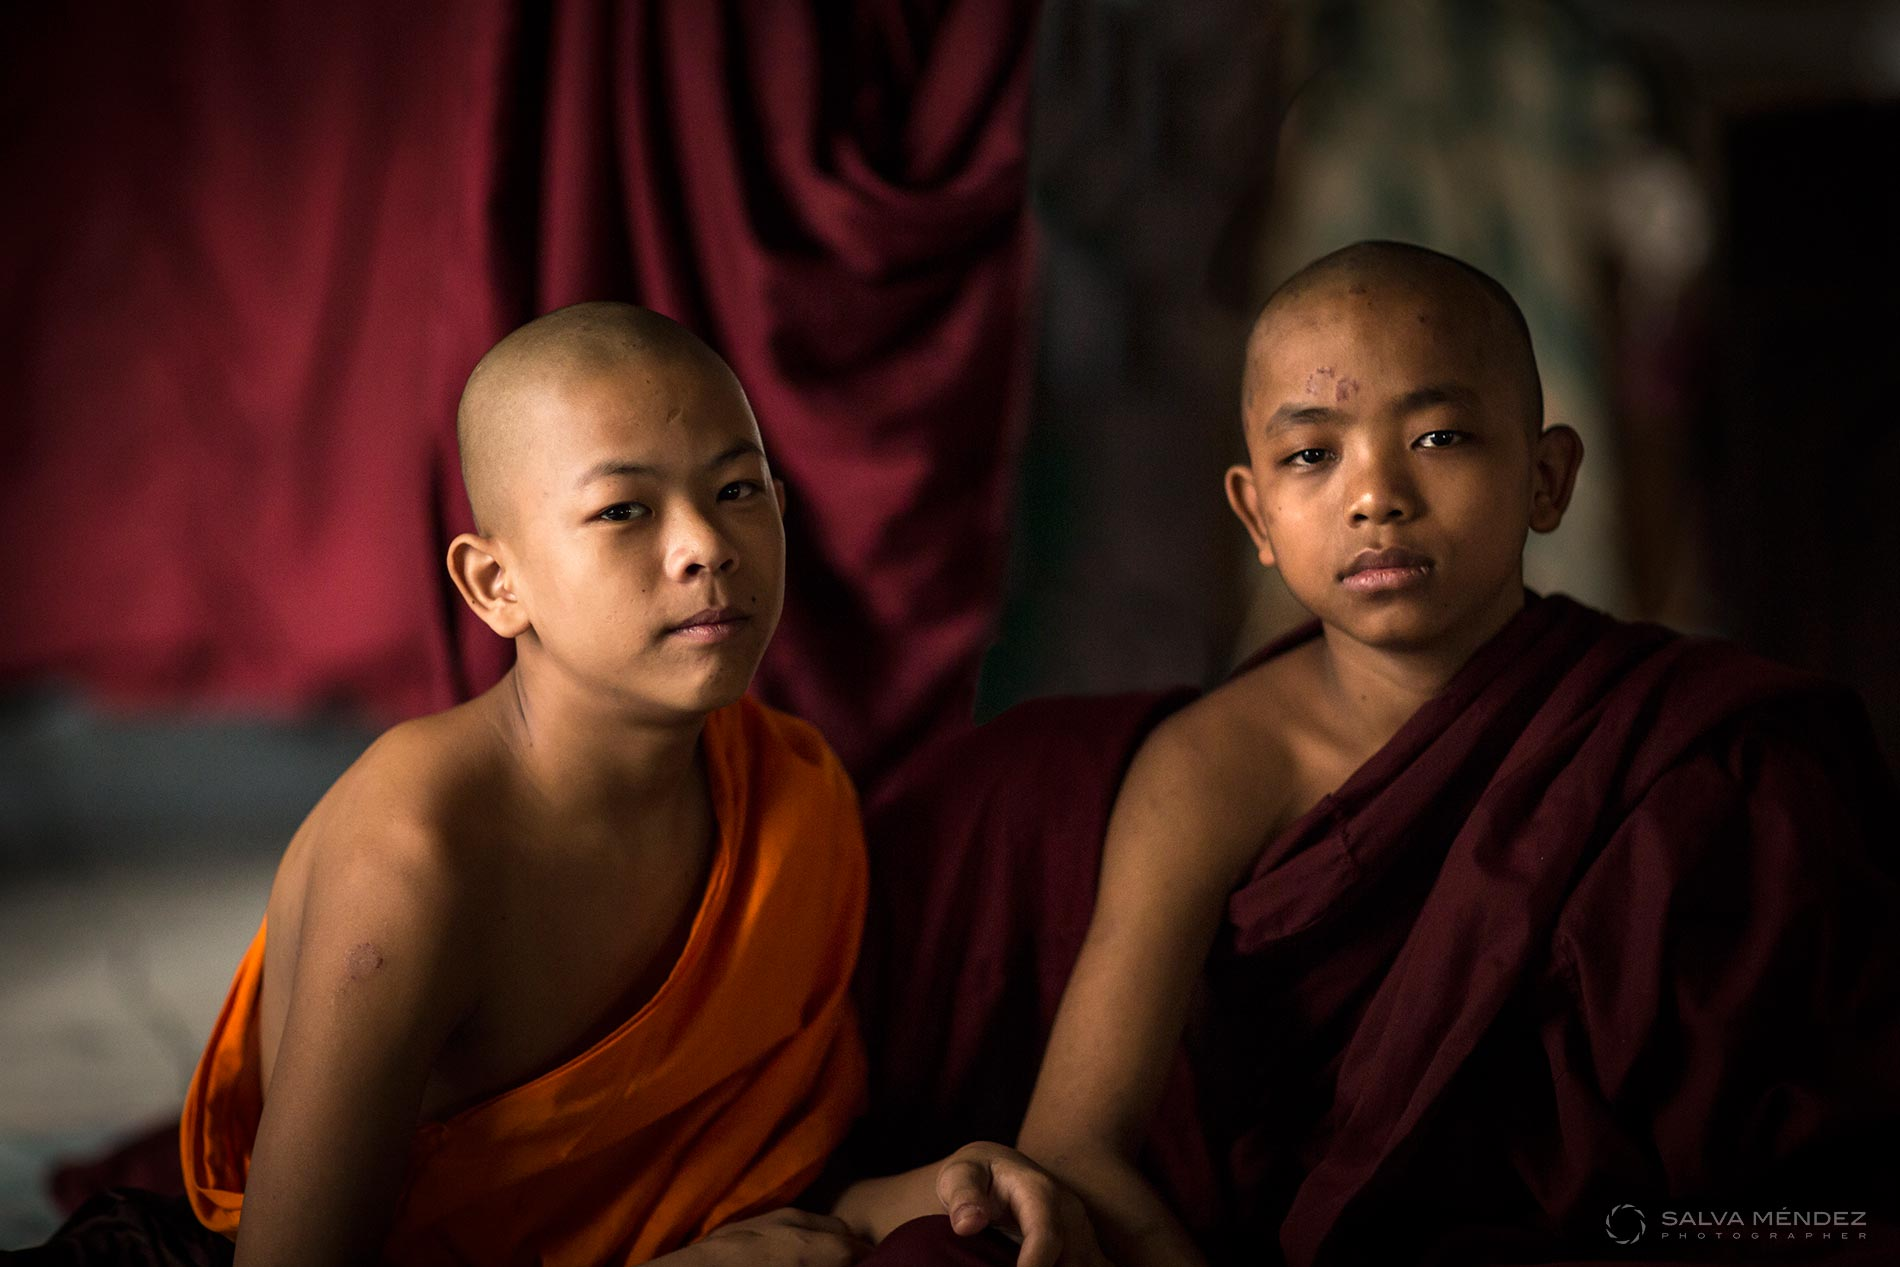 01_02_SALVA-MENDEZ_MONKS-YANGON_MYANMAR--WEB-1900px.jpg